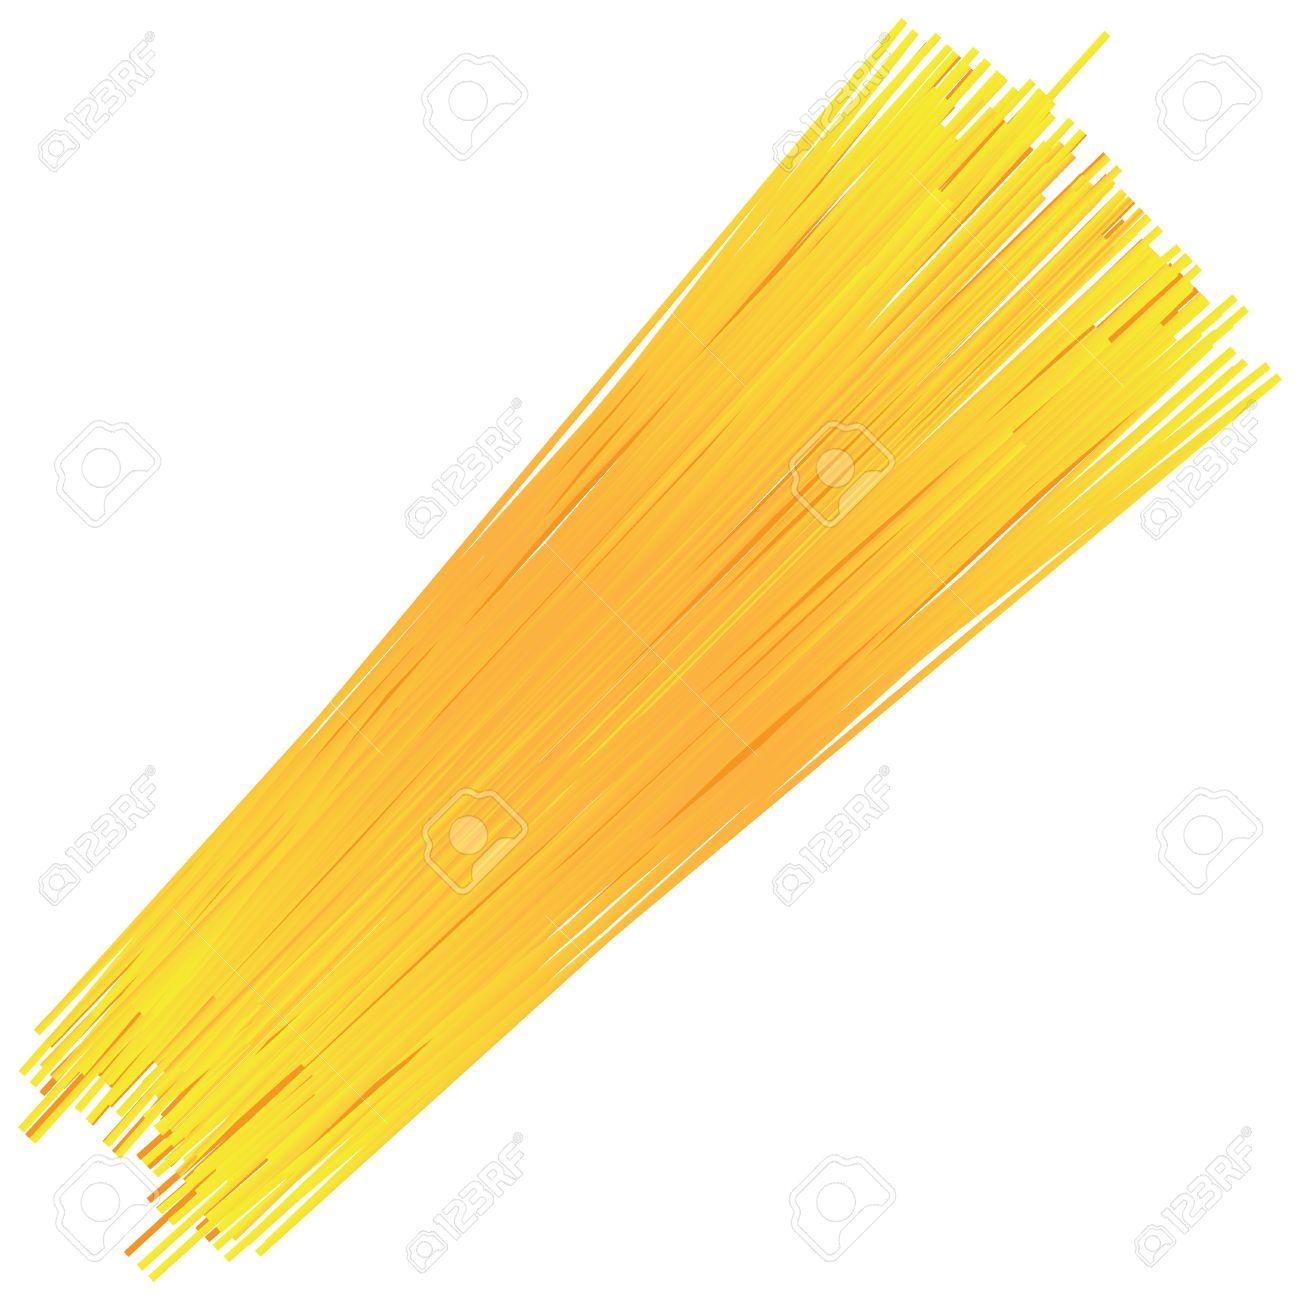 1300x1300 Spaghetti Clipart, Suggestions For Spaghetti Clipart, Download